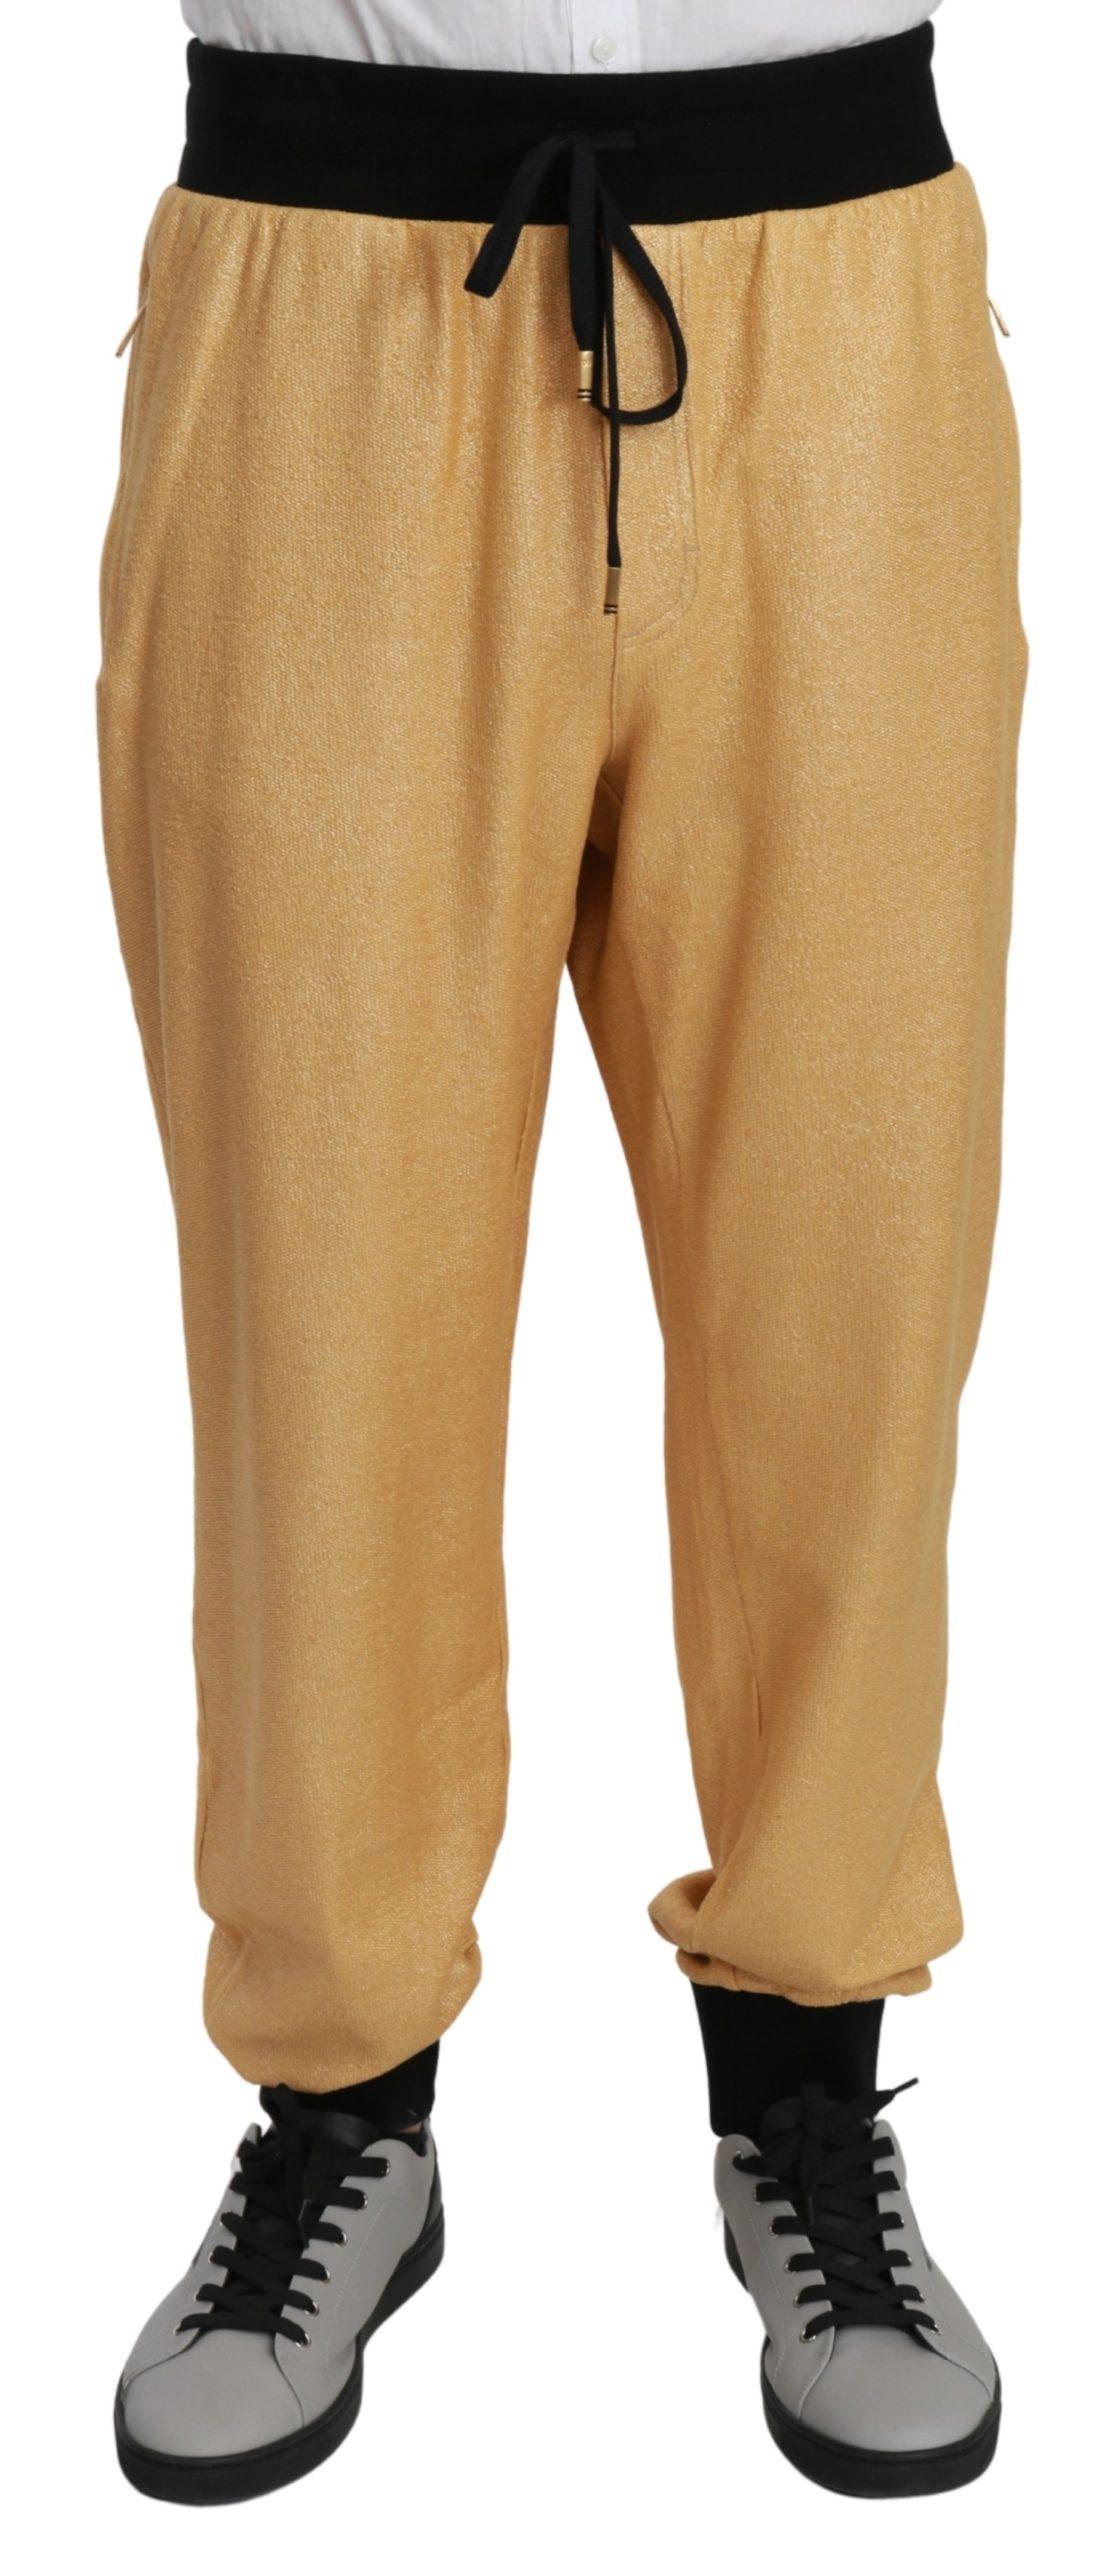 Dolce & Gabbana Men's Year Of The Pig Cotton Trouser Gold PAN70956 - IT56   XXL